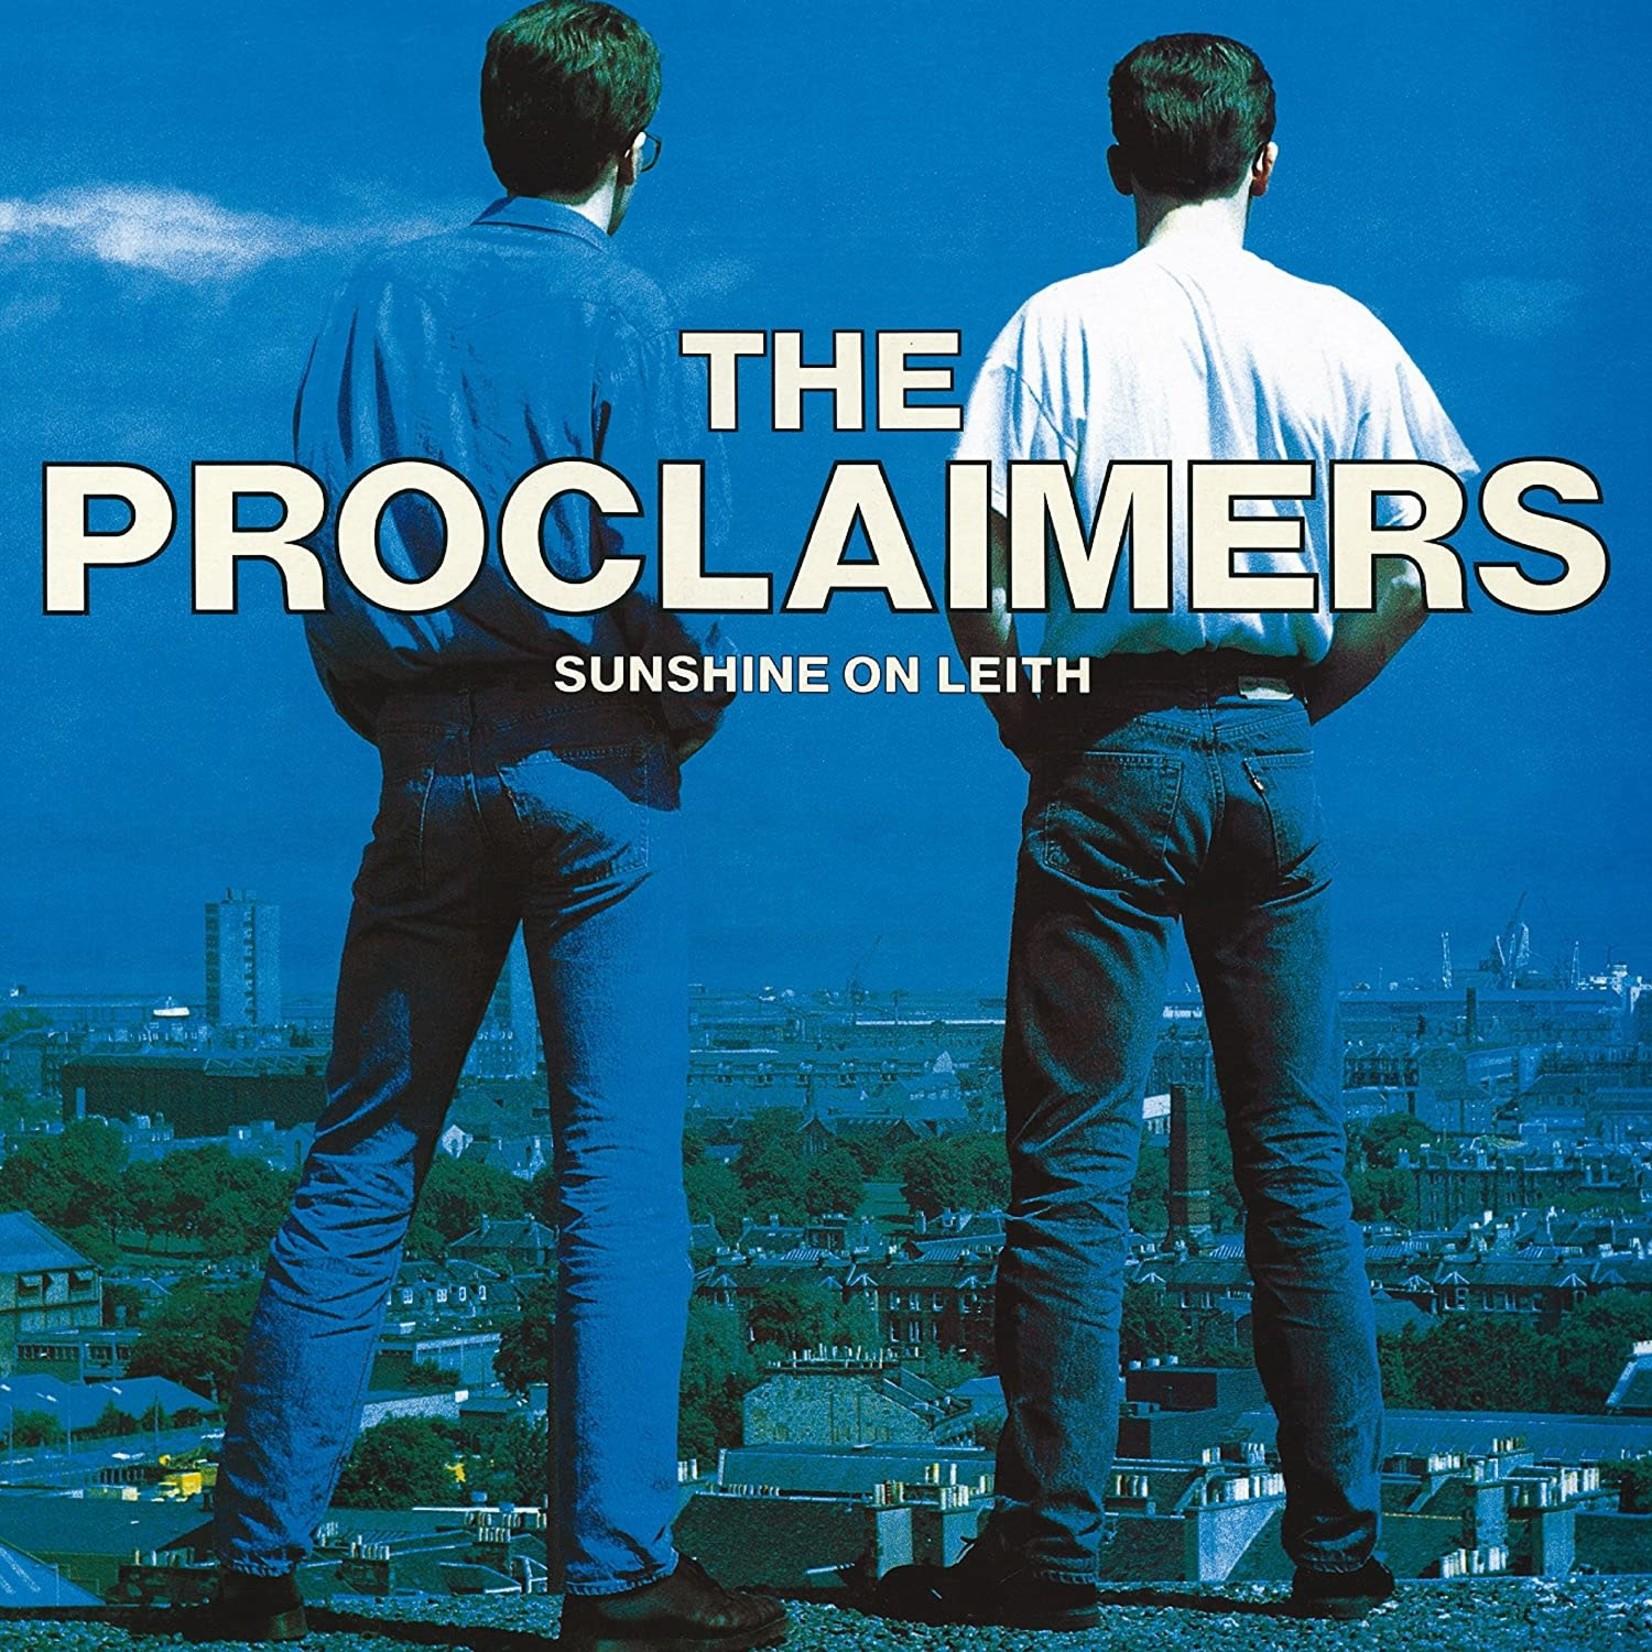 Proclaimers Proclaimers - Sunshine on Leith